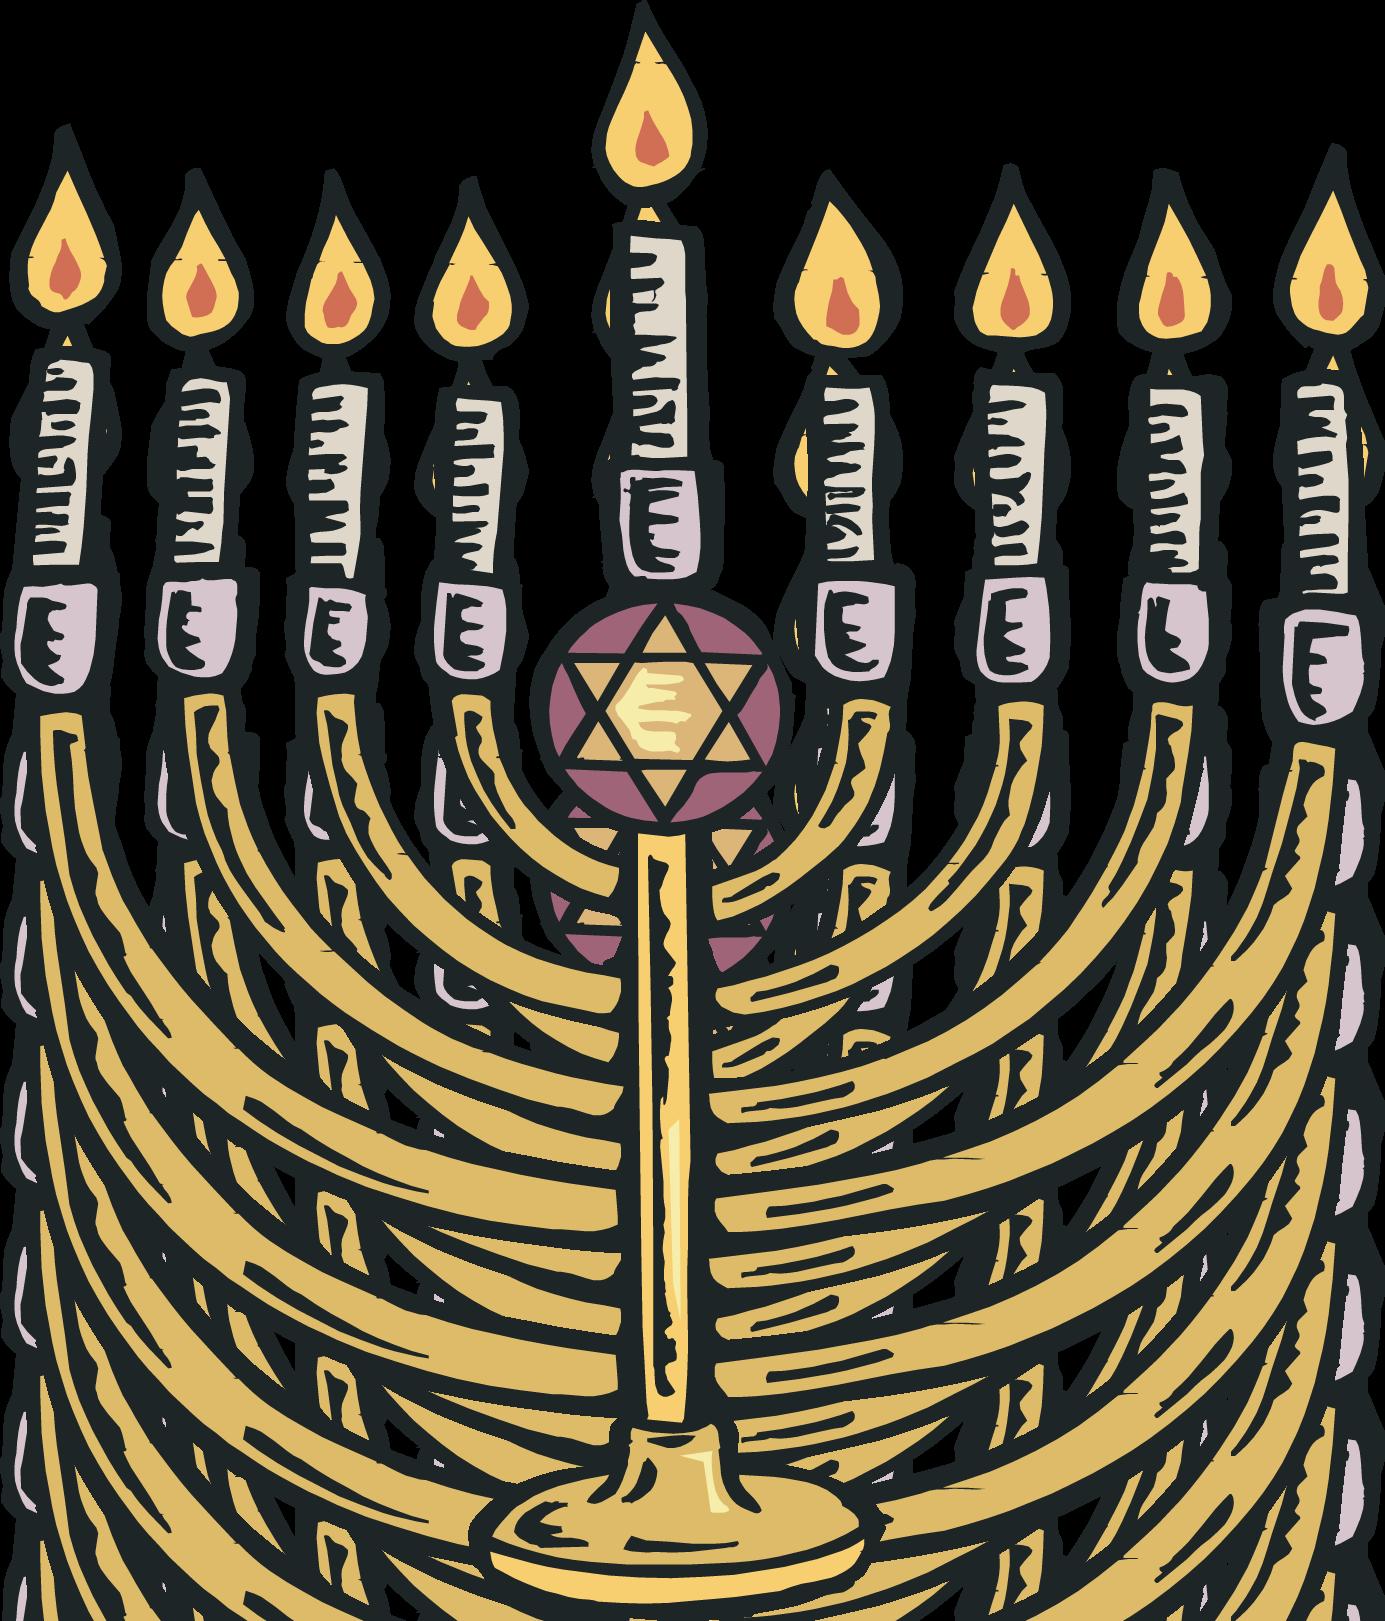 Jewish menorah cliparts free download clip art 3